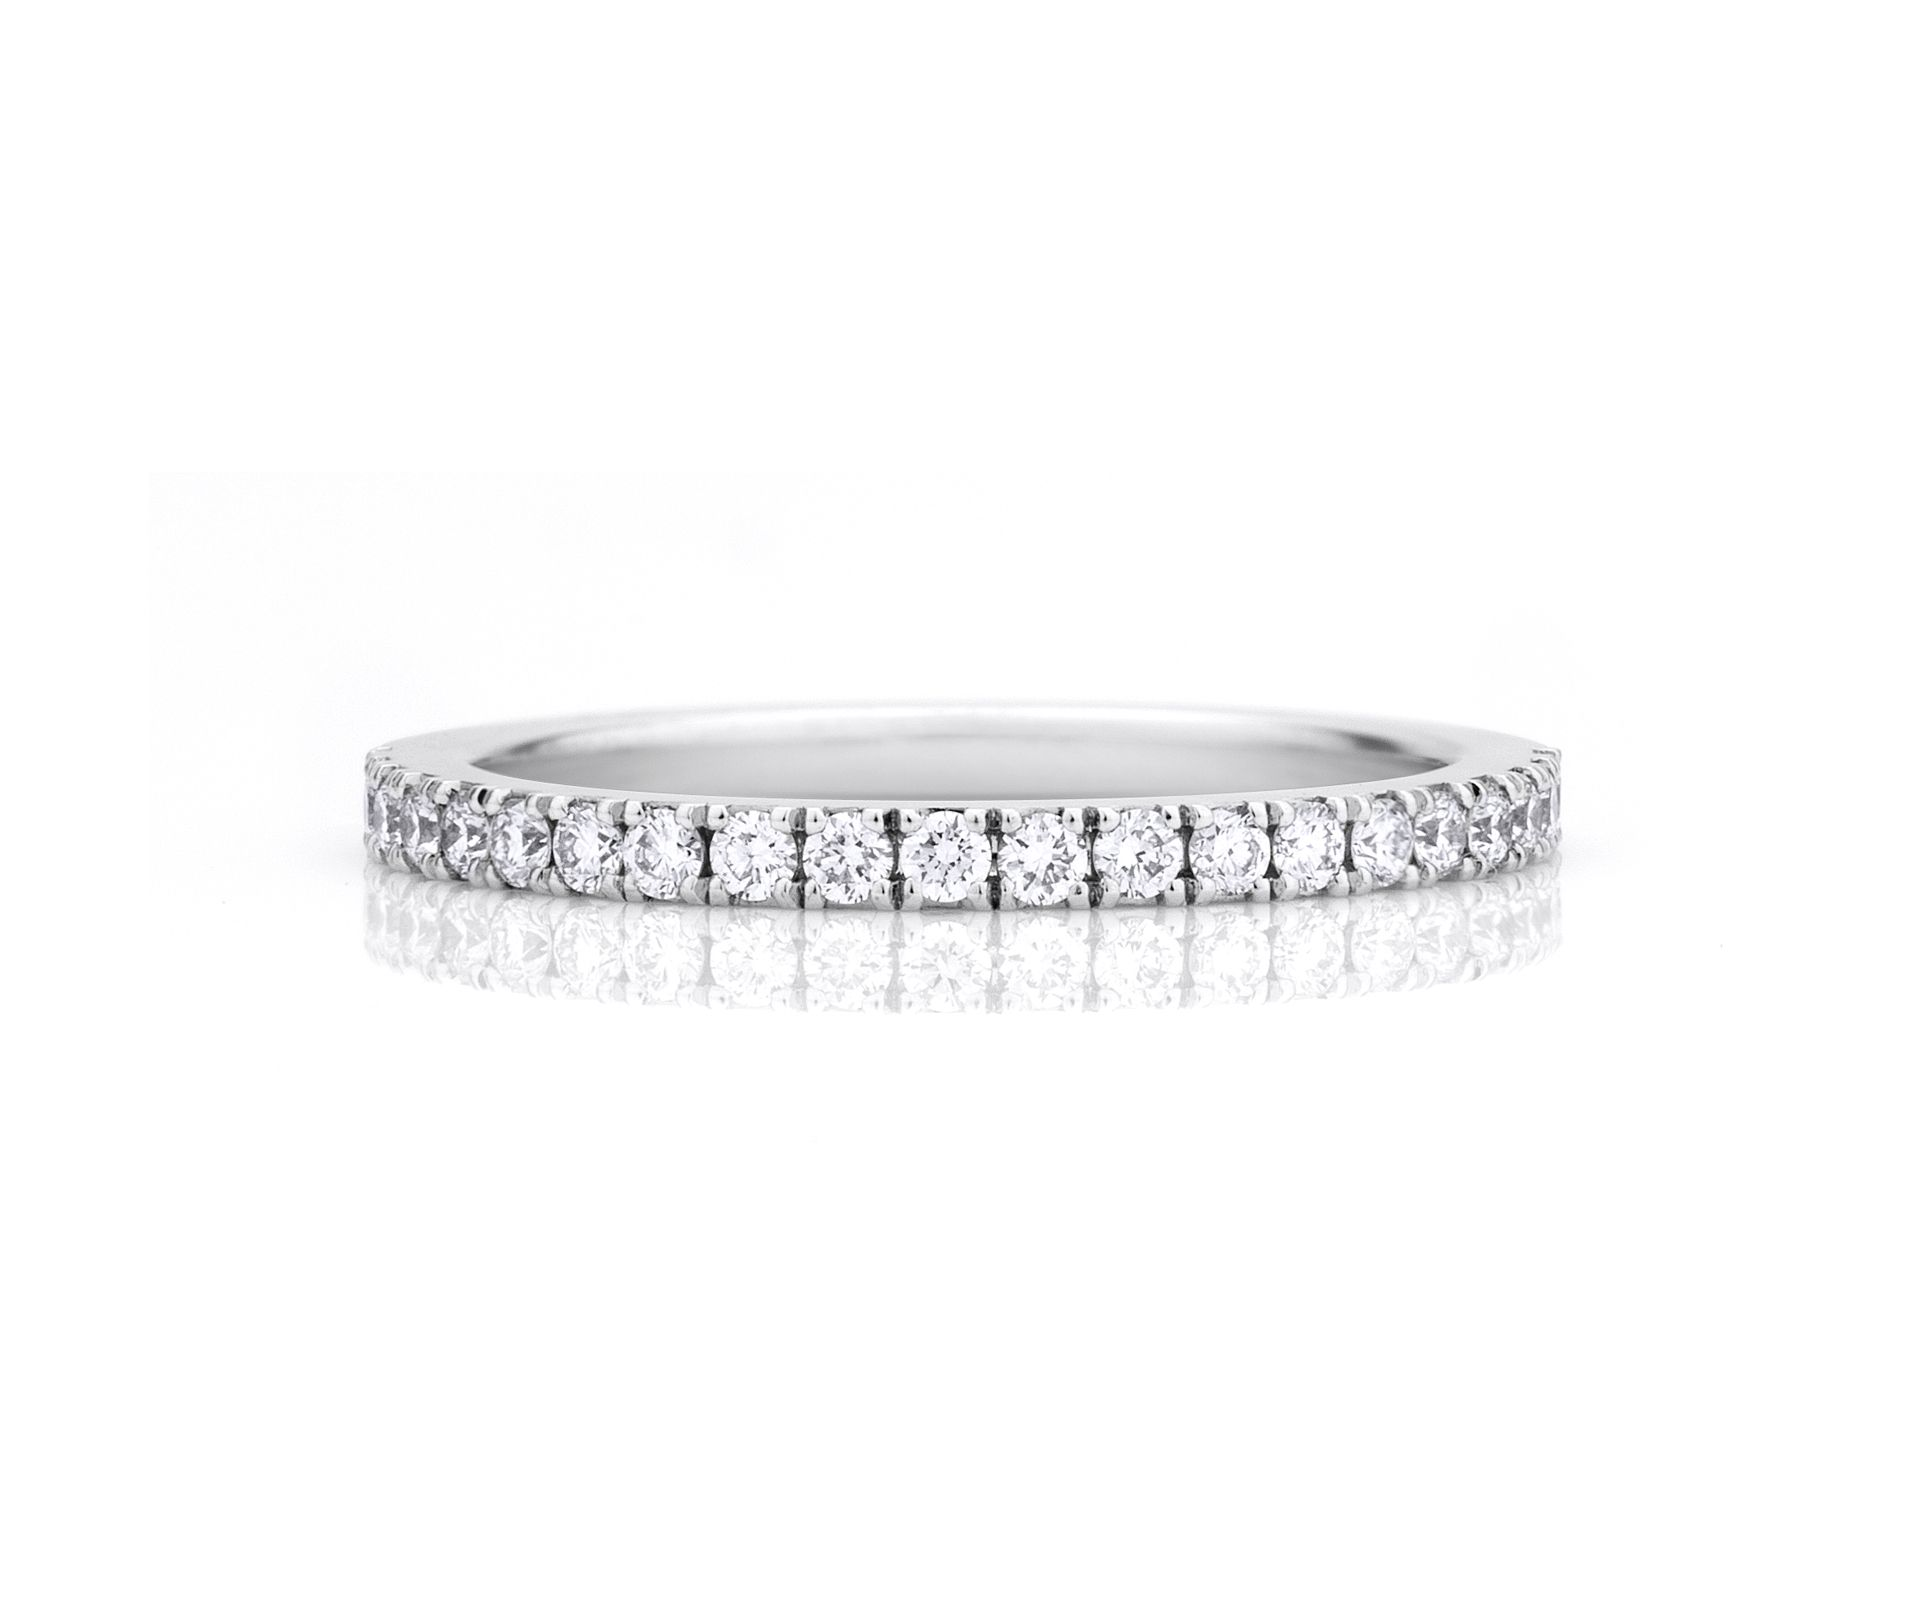 a4a2273013a36 DB Classic Pavé Eternity Band | DE BEERS JEWELRY | Diamond wedding ...